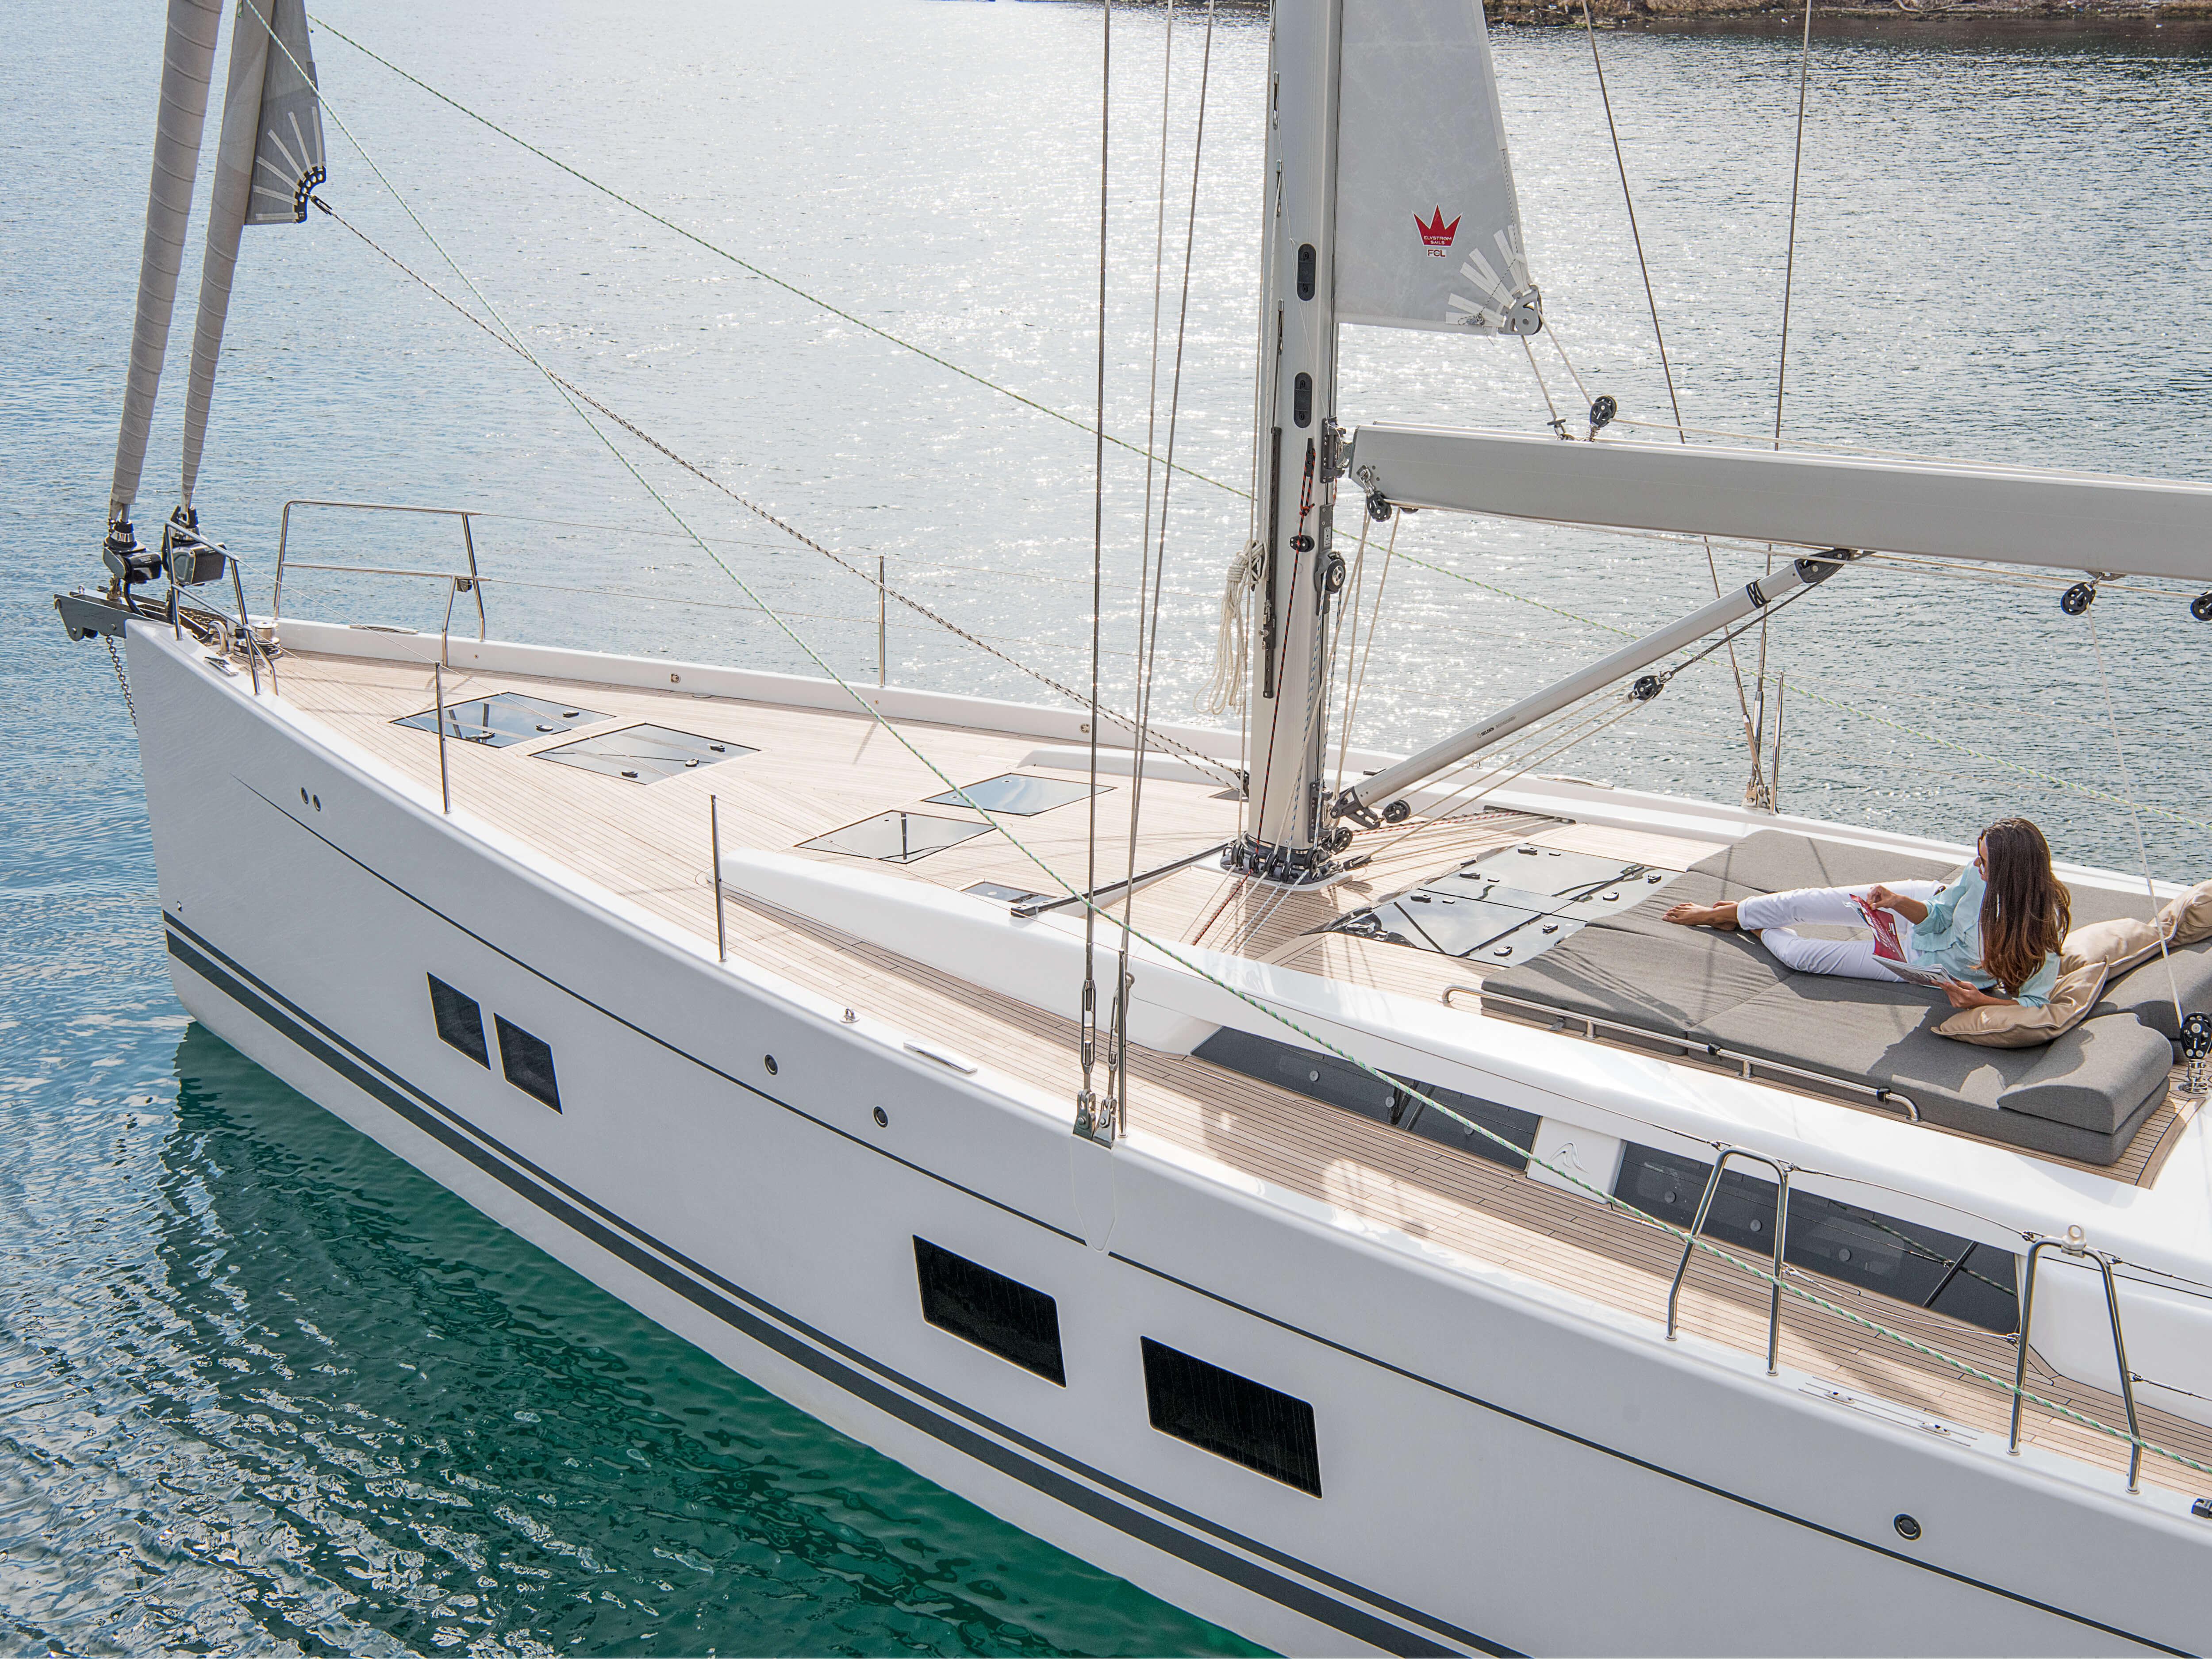 Hanse 588 Exterior at anchor | sundeck, teak deck, deck hatch, rail | Hanse